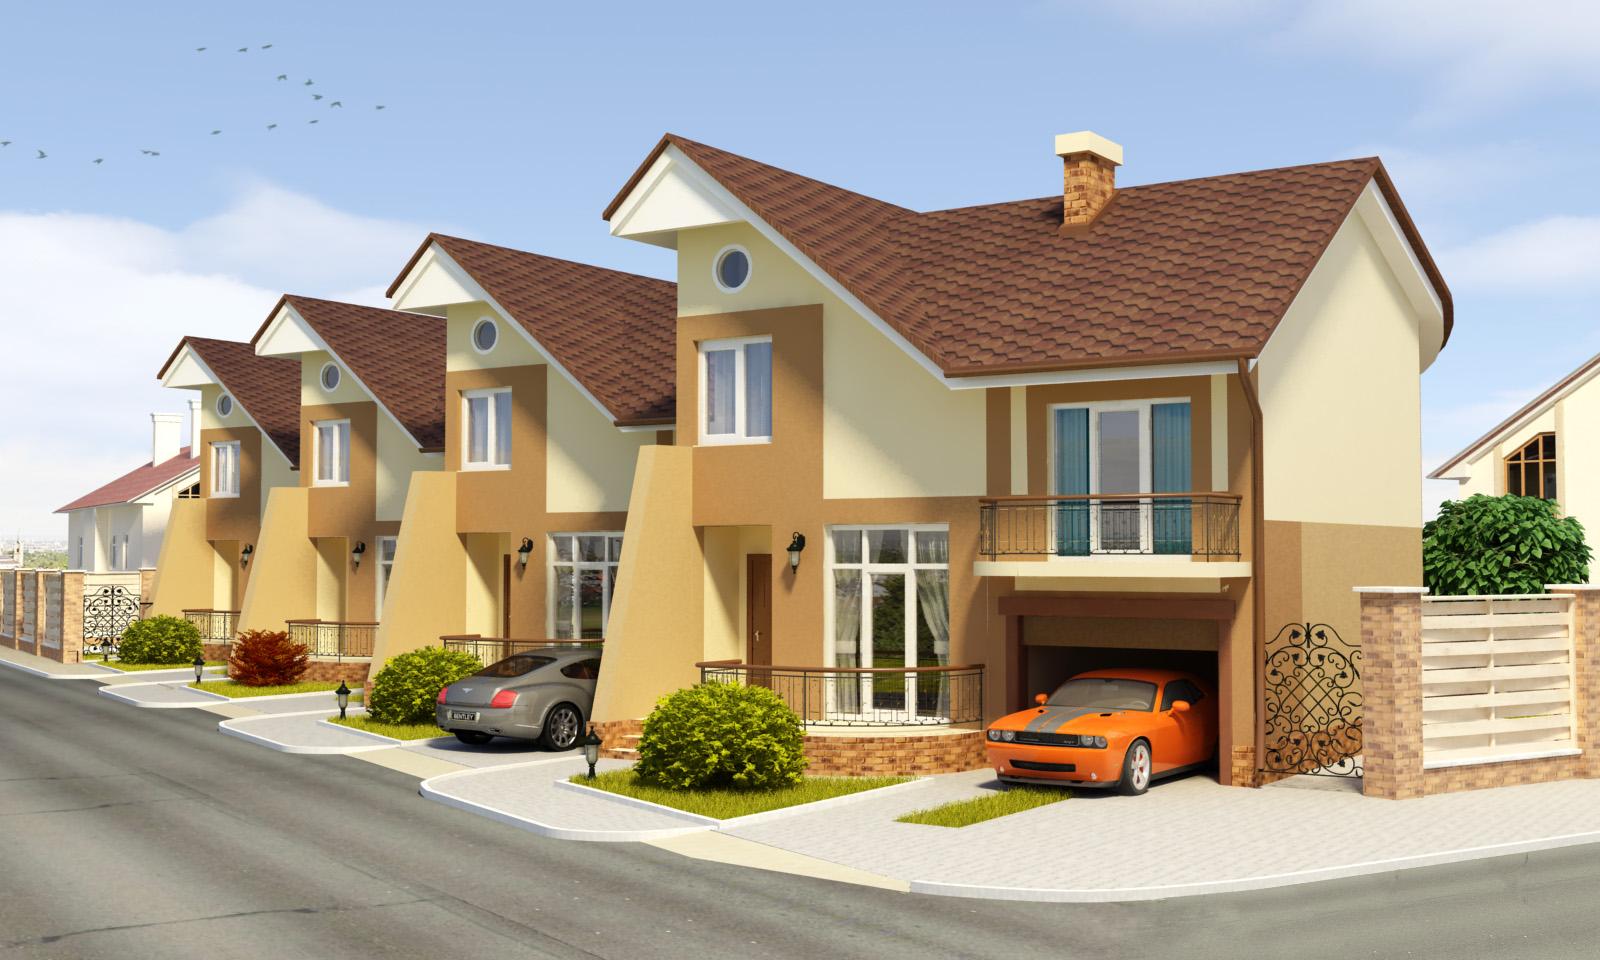 Картинка дом с квартирами